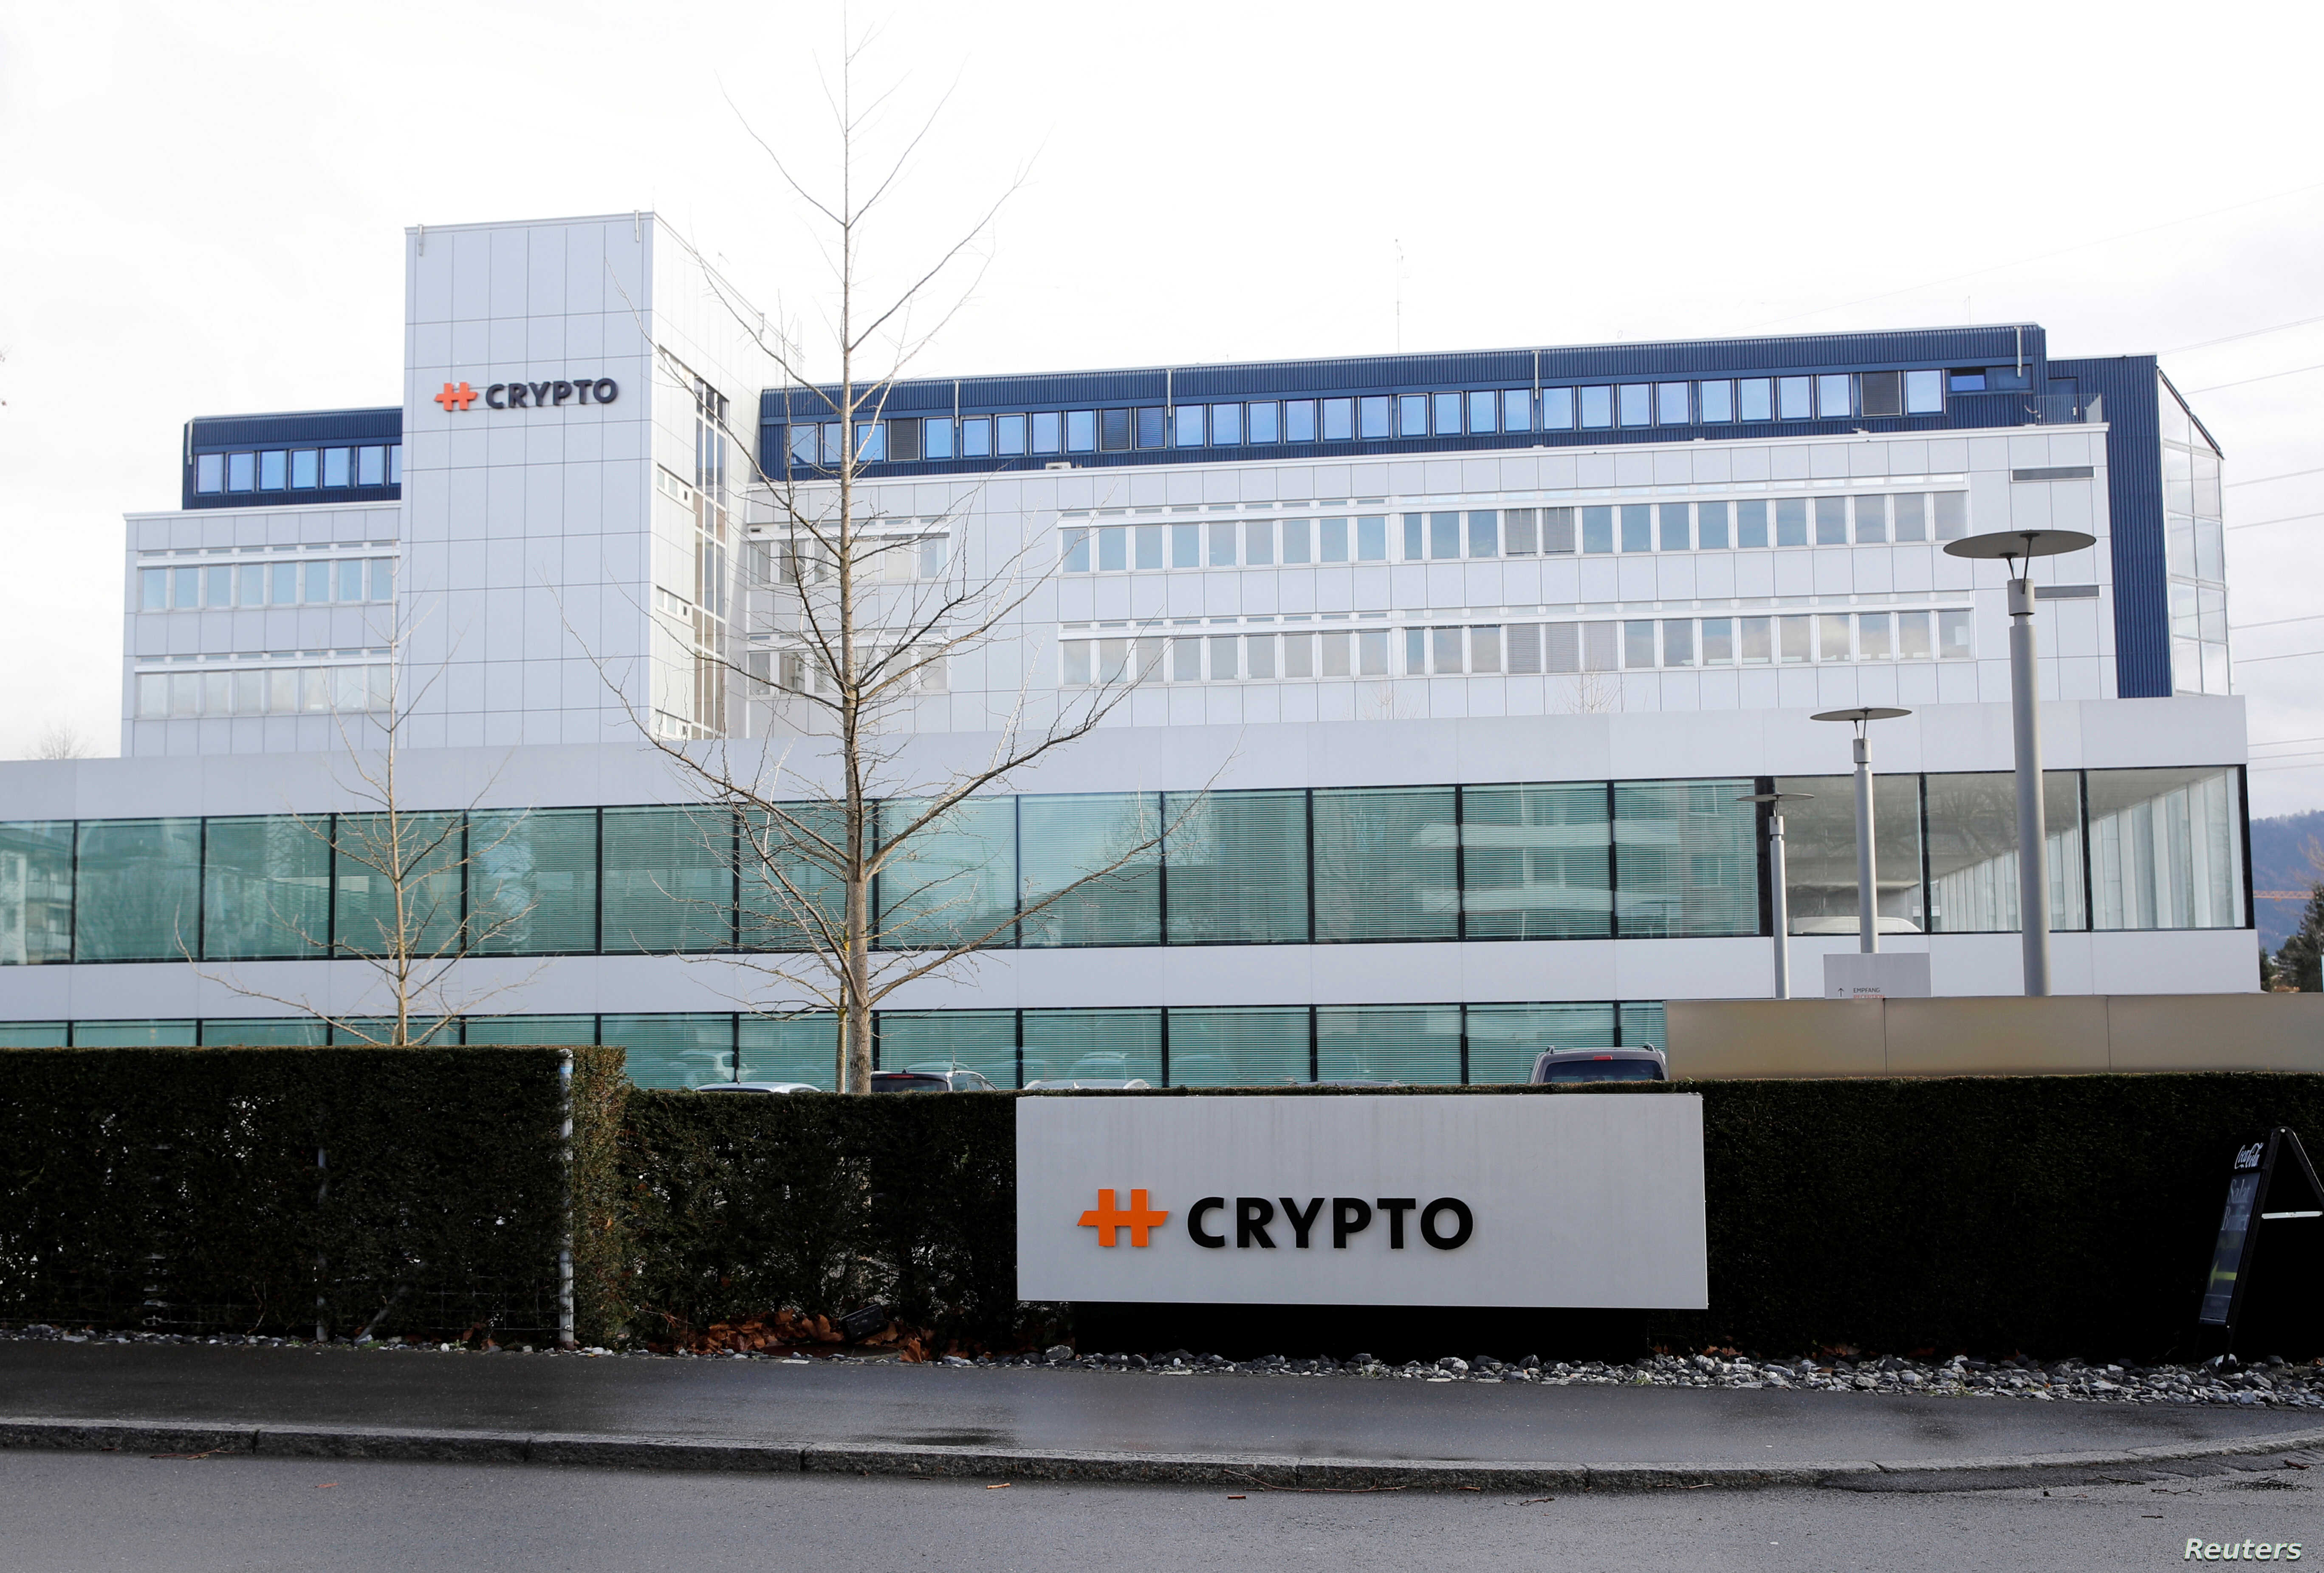 باڵهخانهی كۆمپانیای كریپتۆ ـ سویسرا